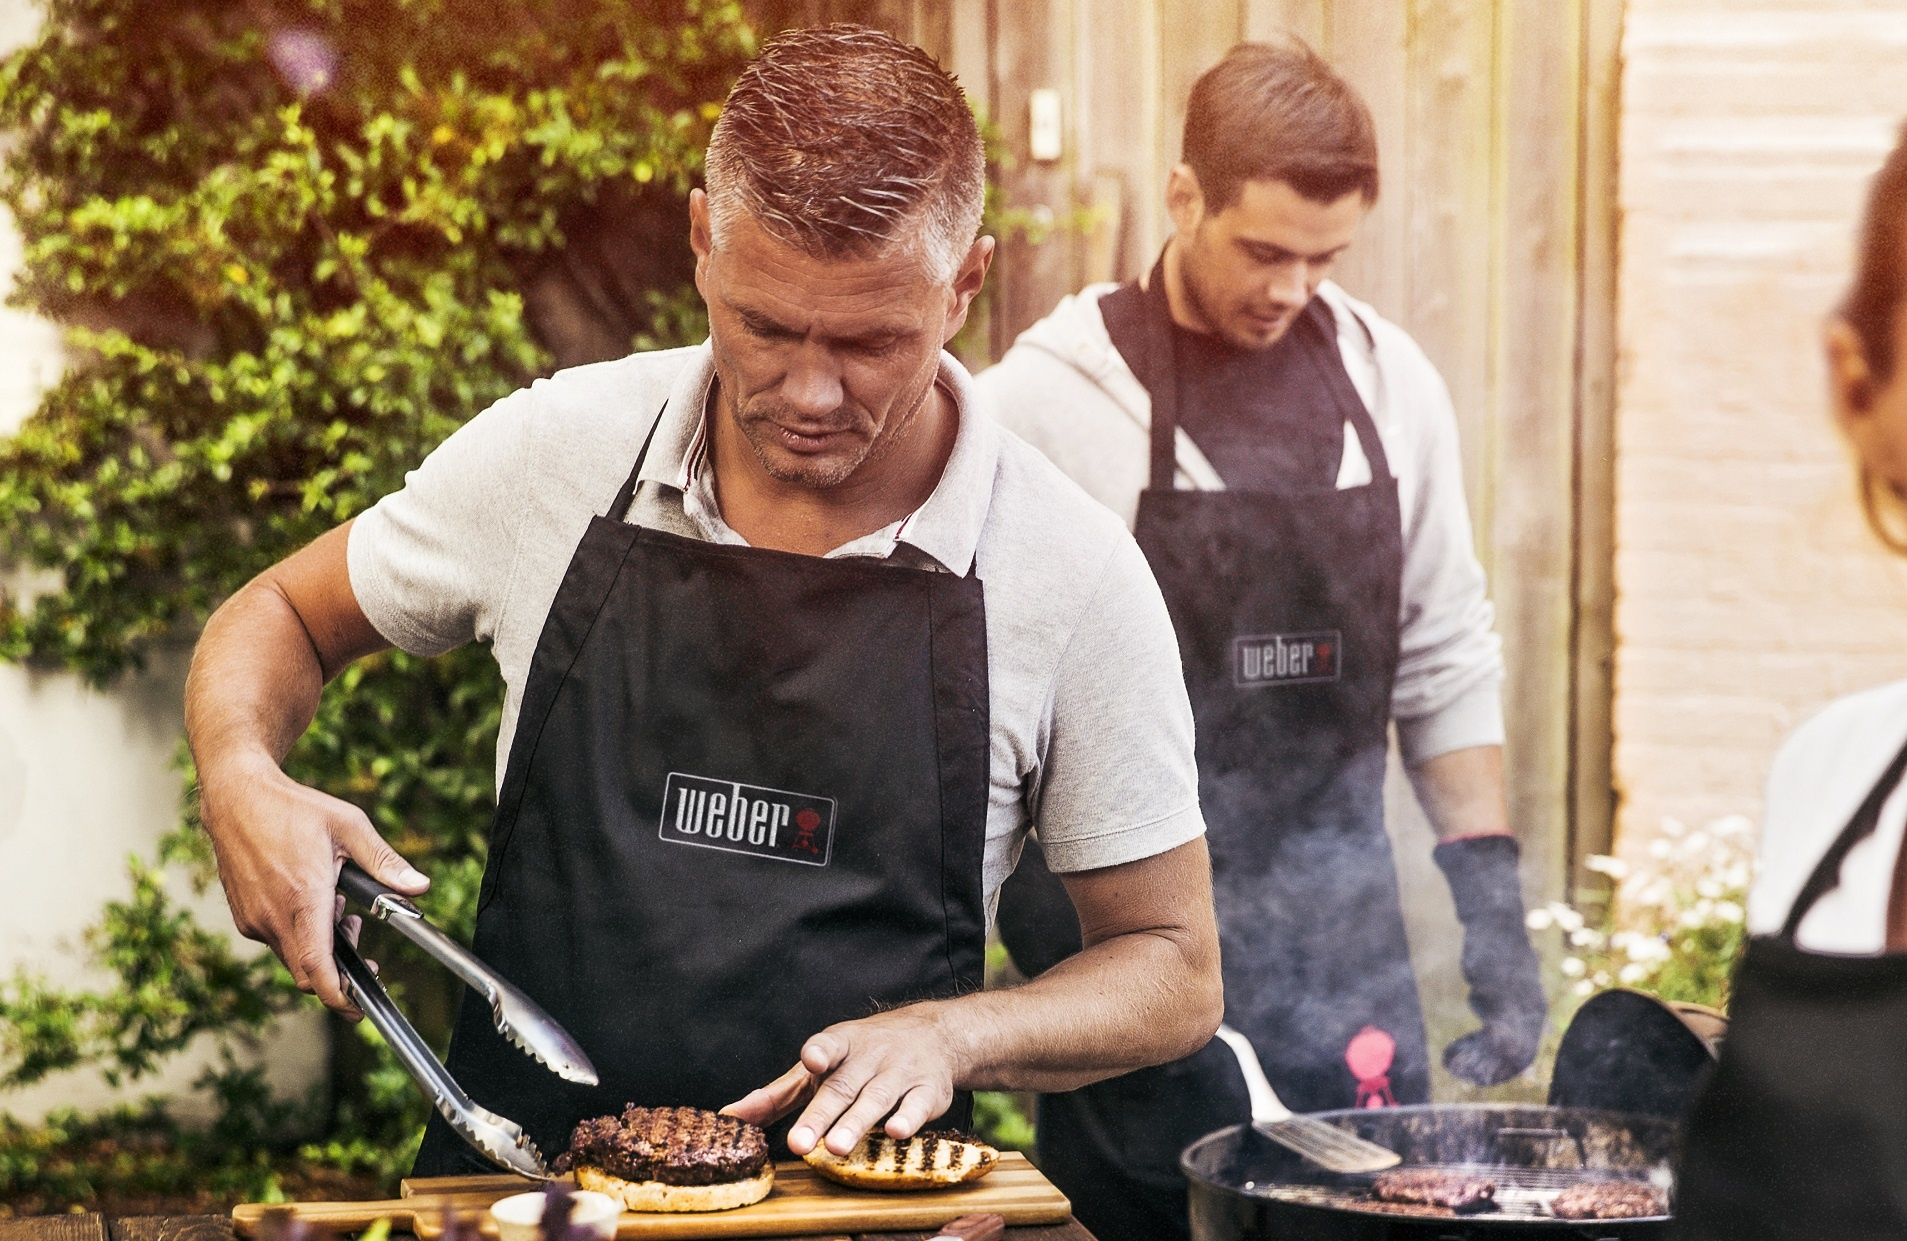 Weber Holzkohlegrill Bratwurst : Weber grill menü thema noch offen de